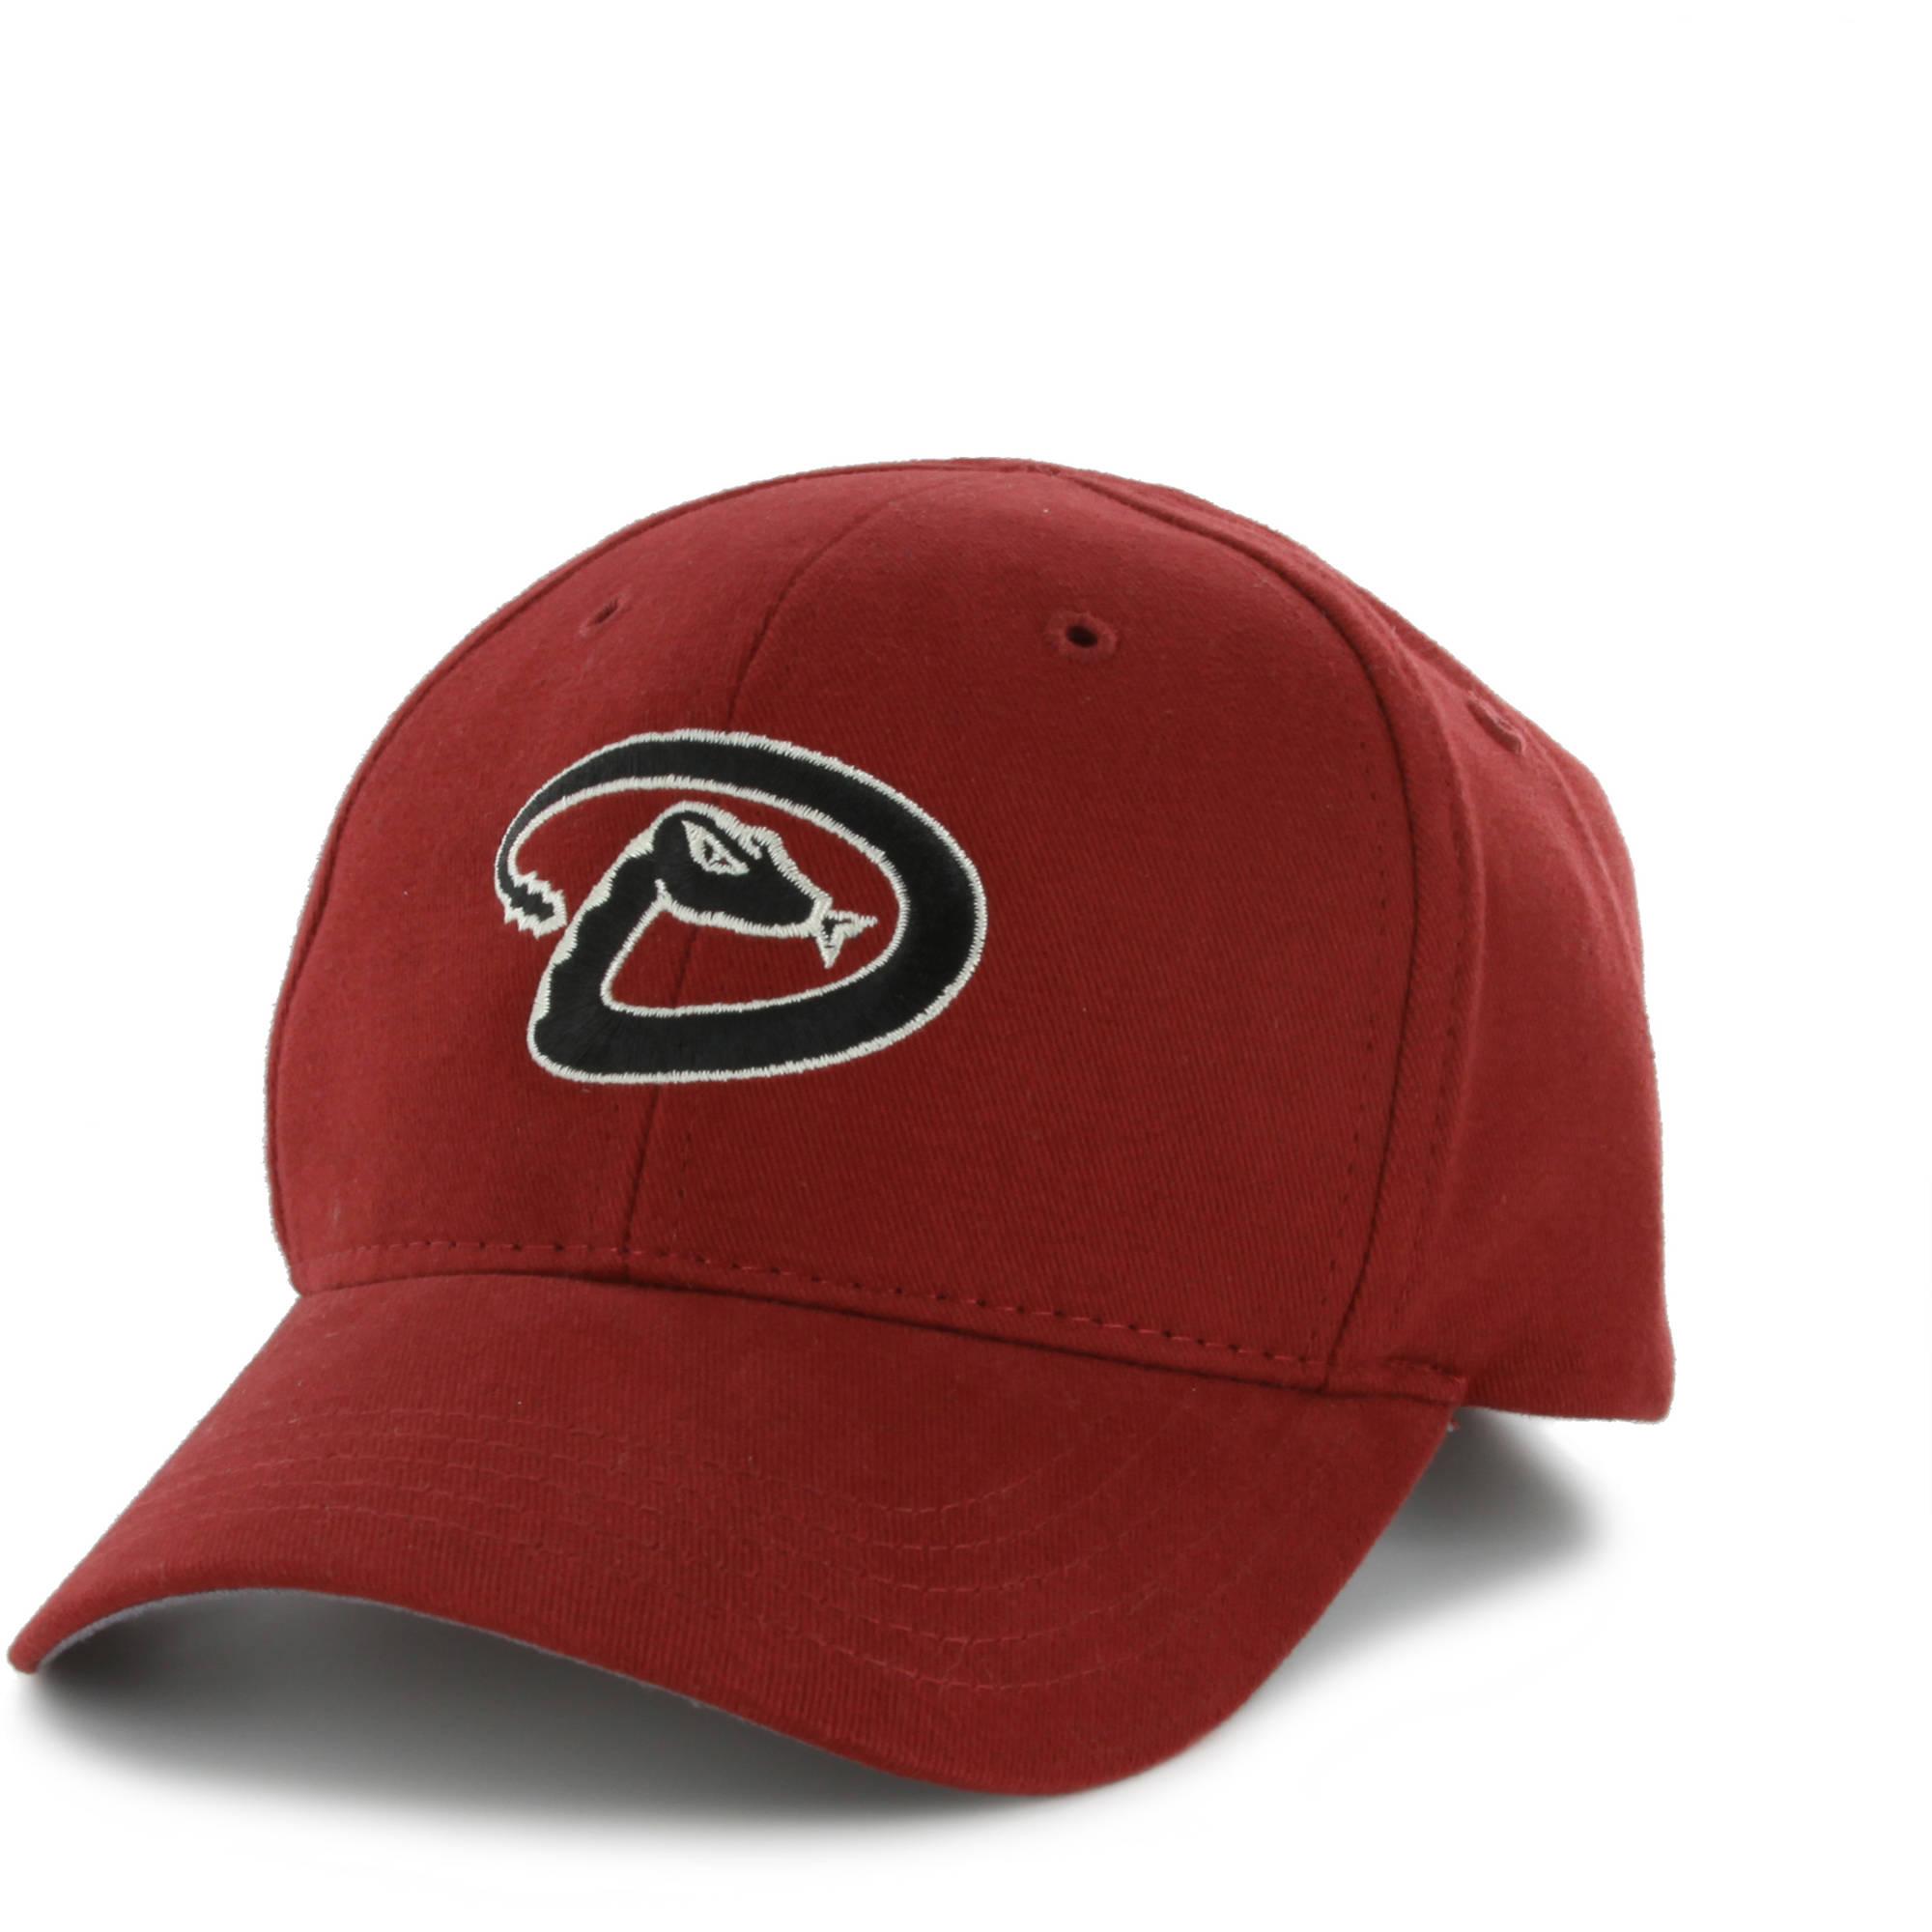 MLB Arizona Diamondbacks Basic Cap / Hat by Fan Favorite